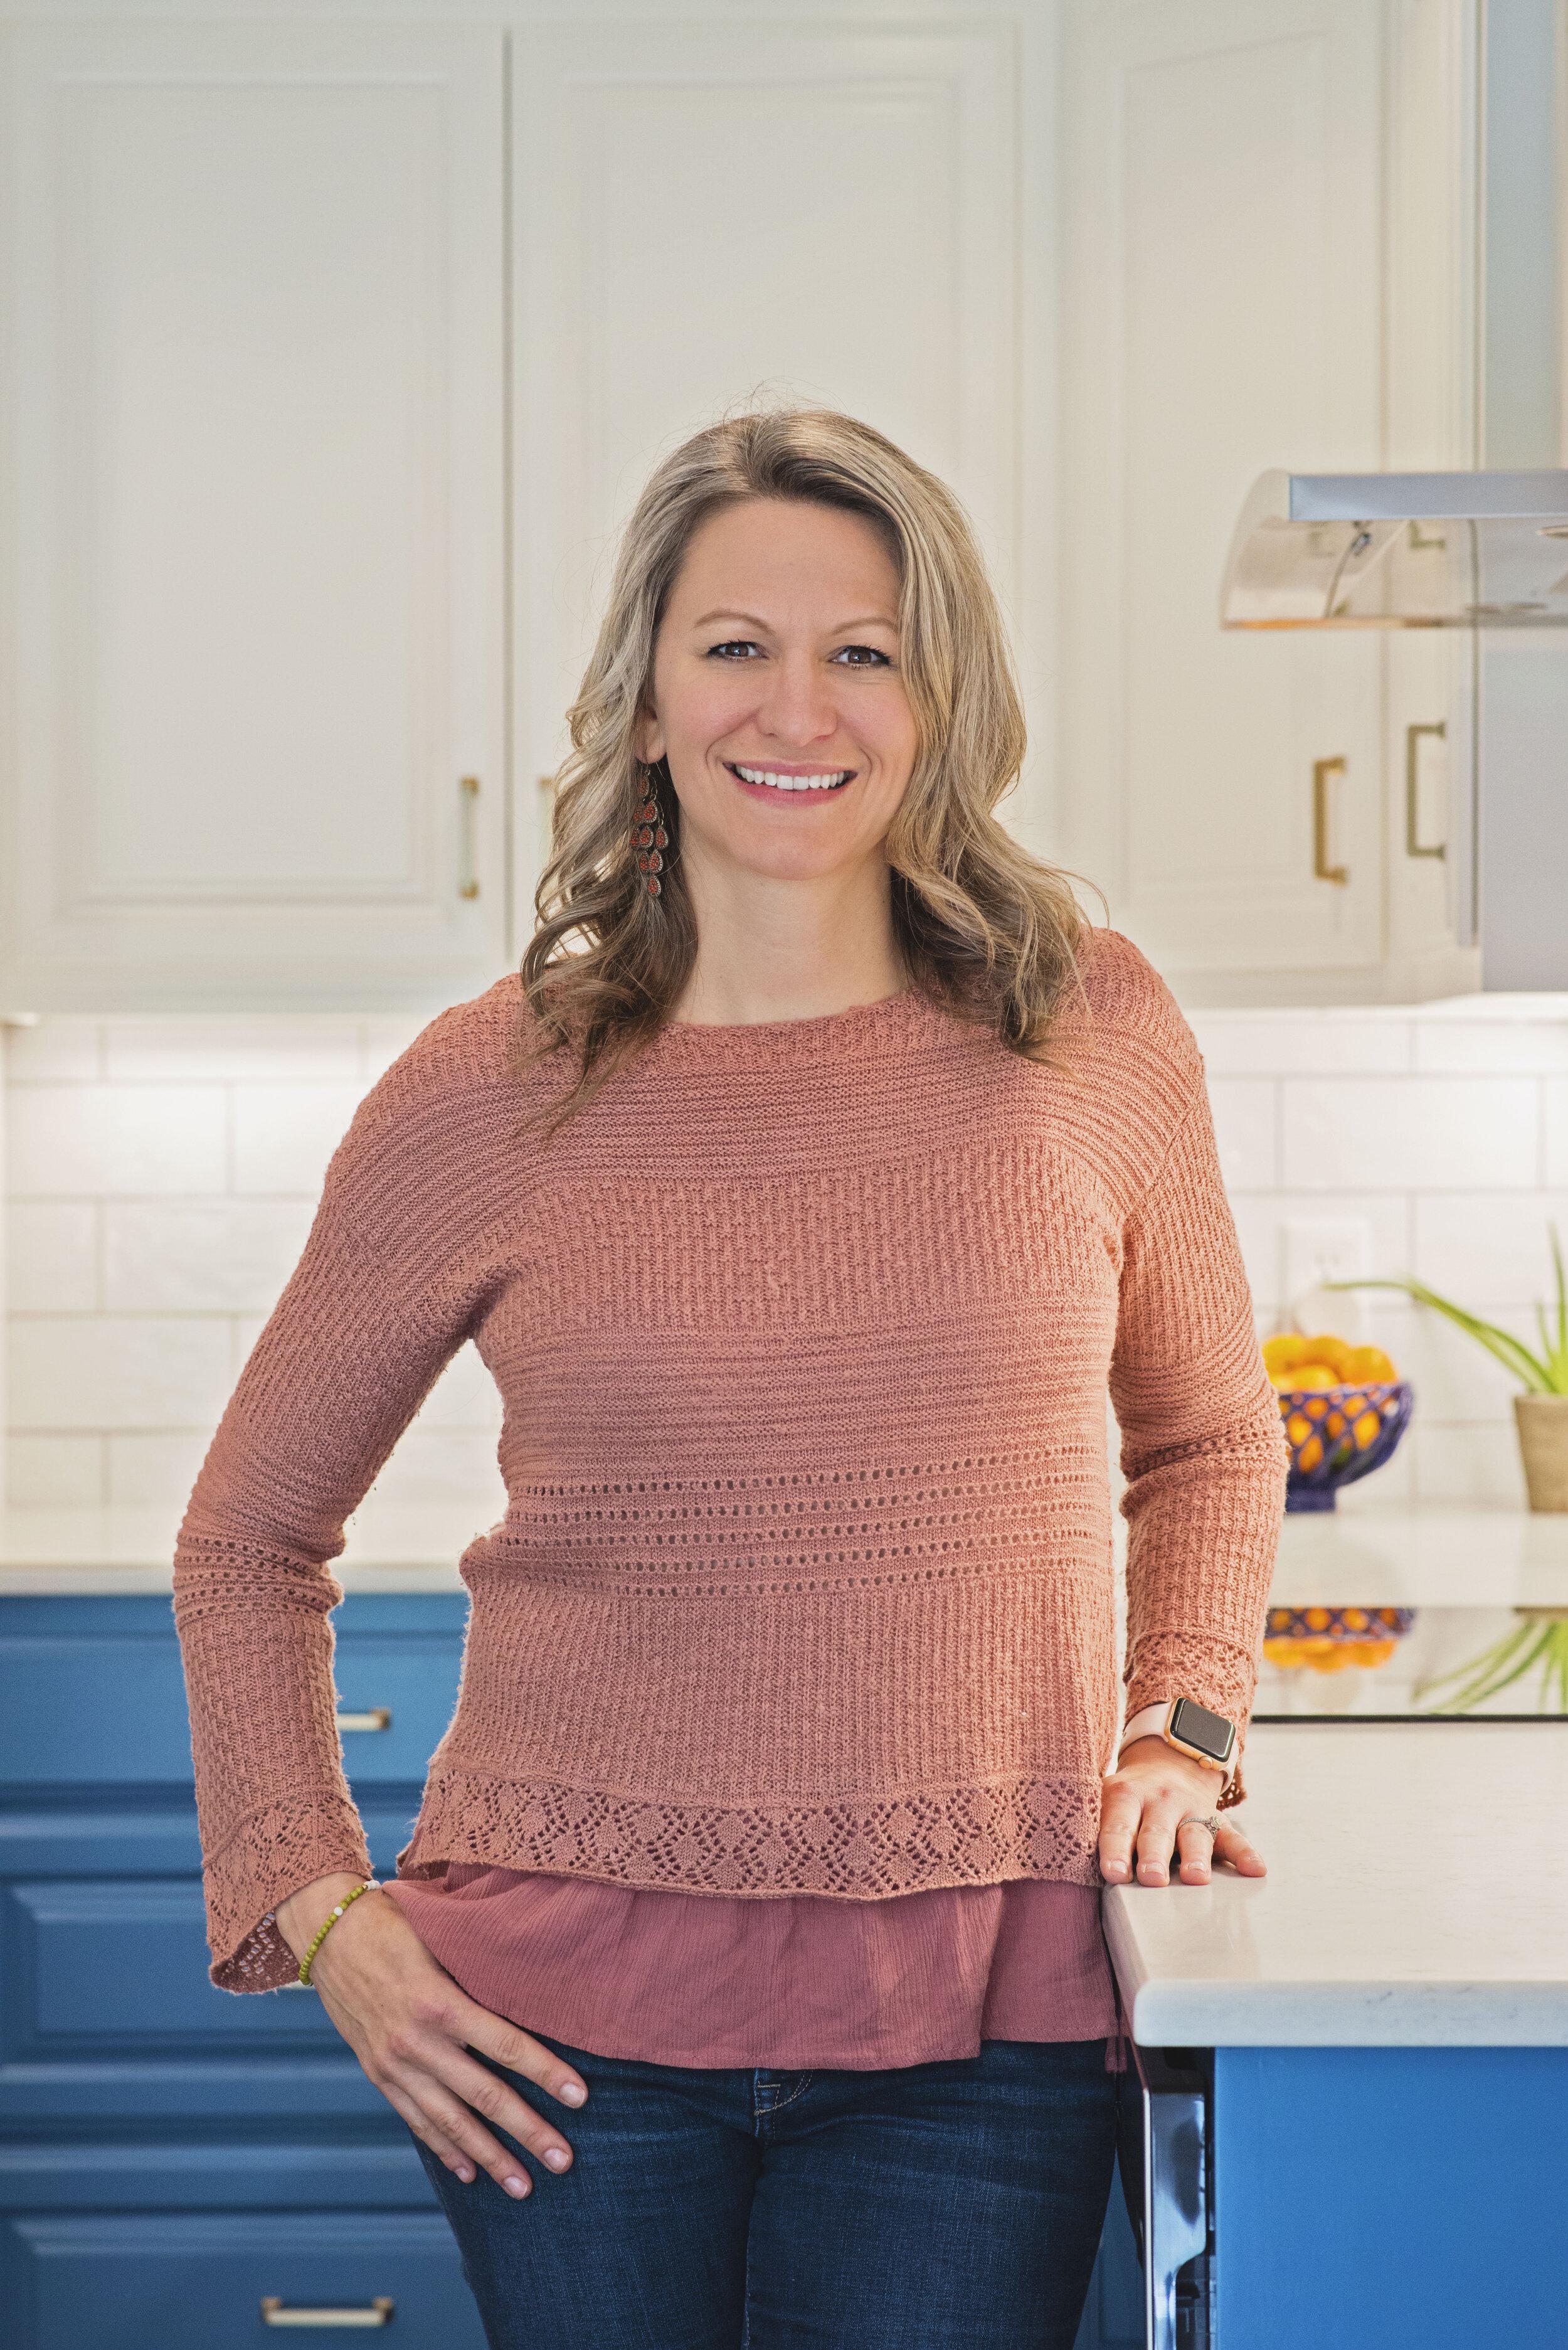 Rebecca Robinson, Creative Director and Owner